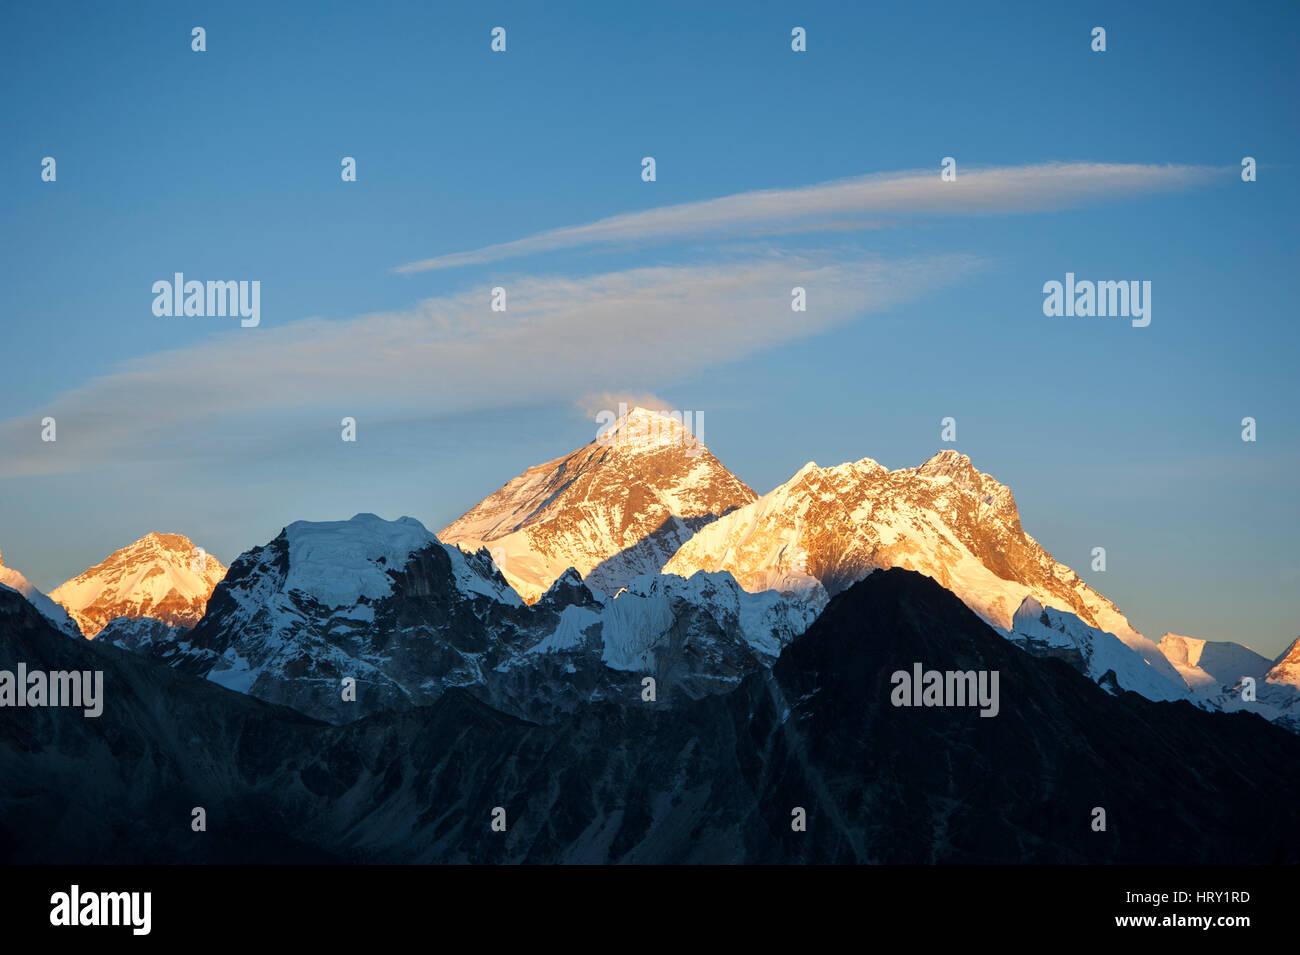 Sun setting over Mount Everest, Himalayas, Nepal, Asia - Stock Image